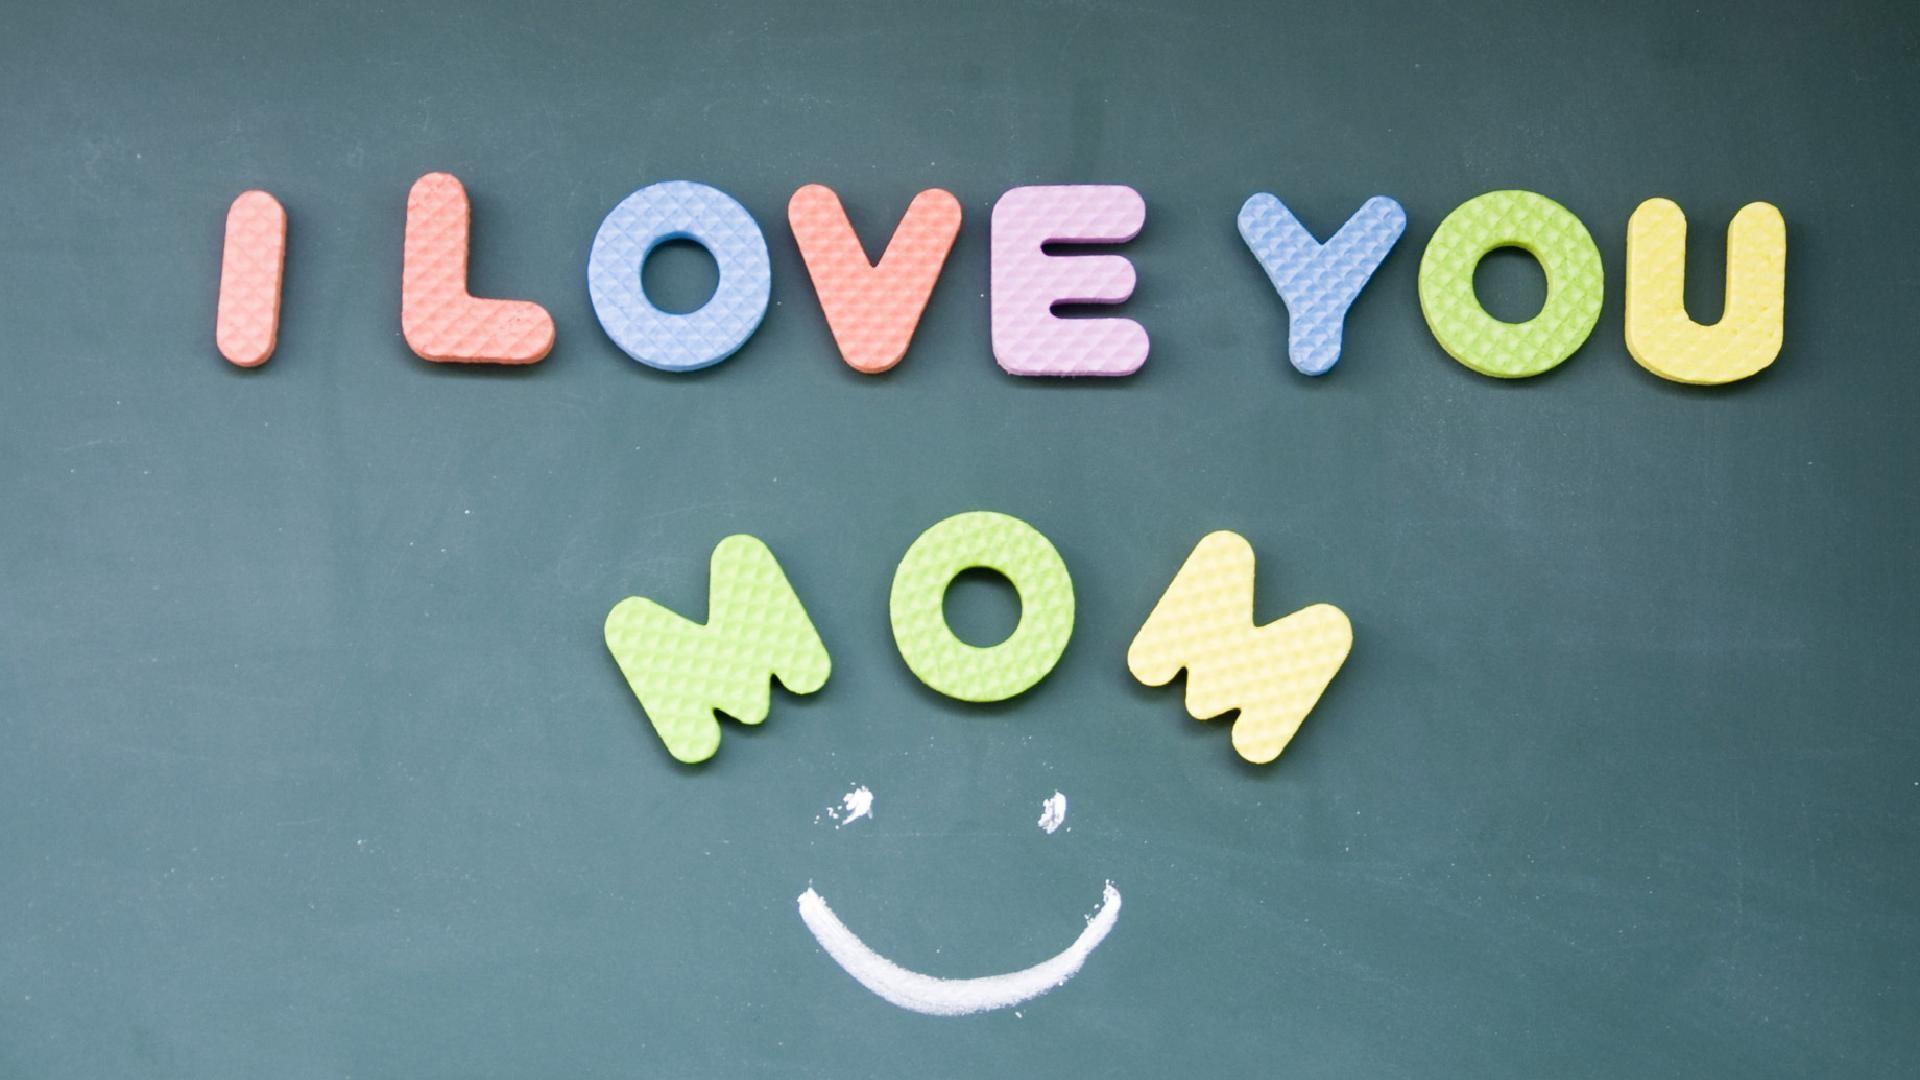 I Love You MomHD Wallpapers